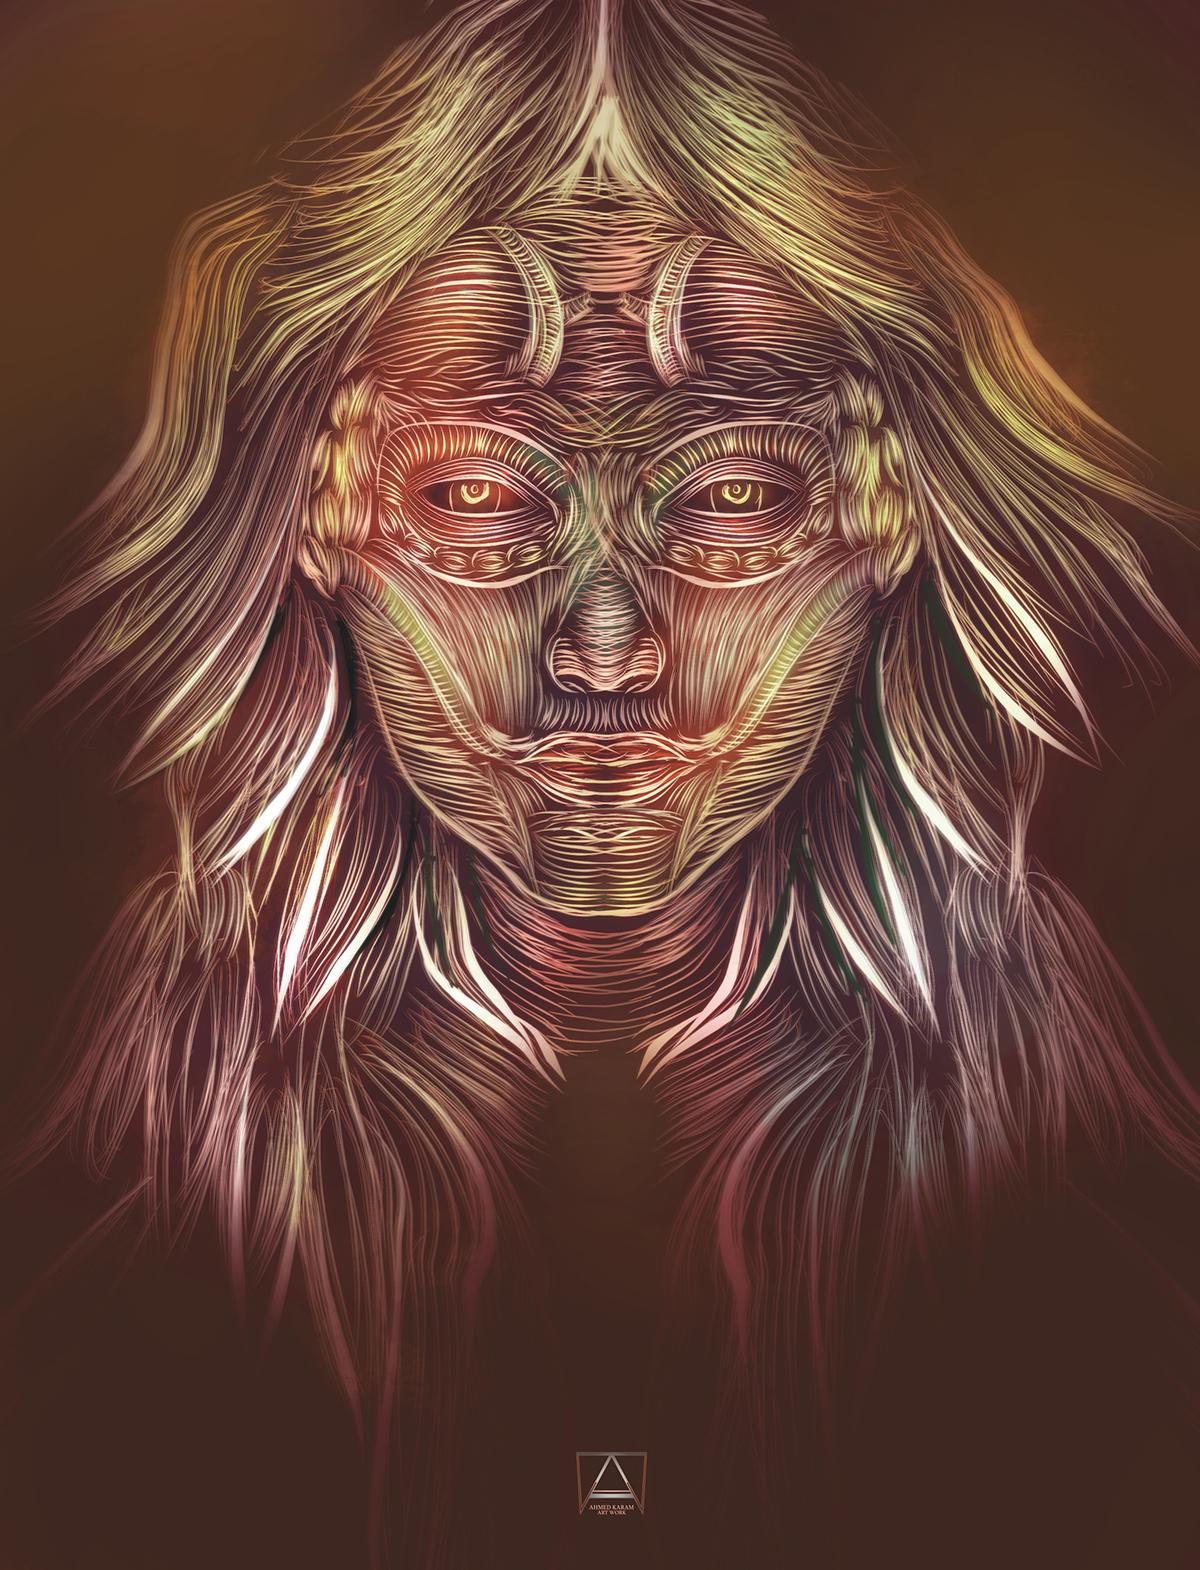 journeys art Collective  dark episodes trip1 digitalart SUREAL lowpoly leviitation portrait girl gothic abstract egypt